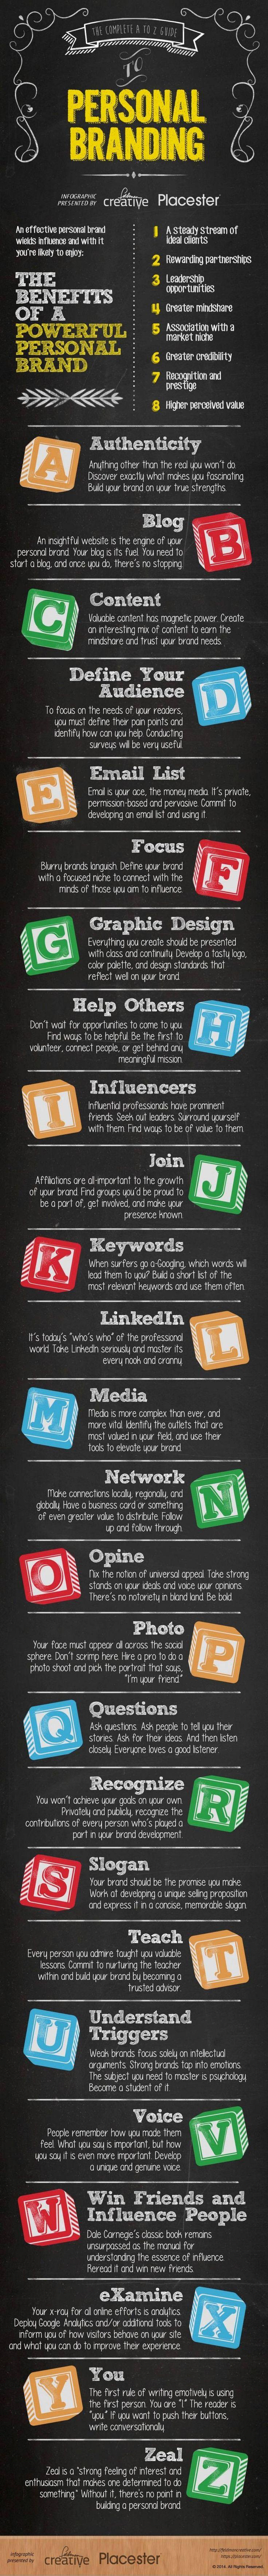 You Personal Branding Guide - A to Z by Barry Feldman via slideshare